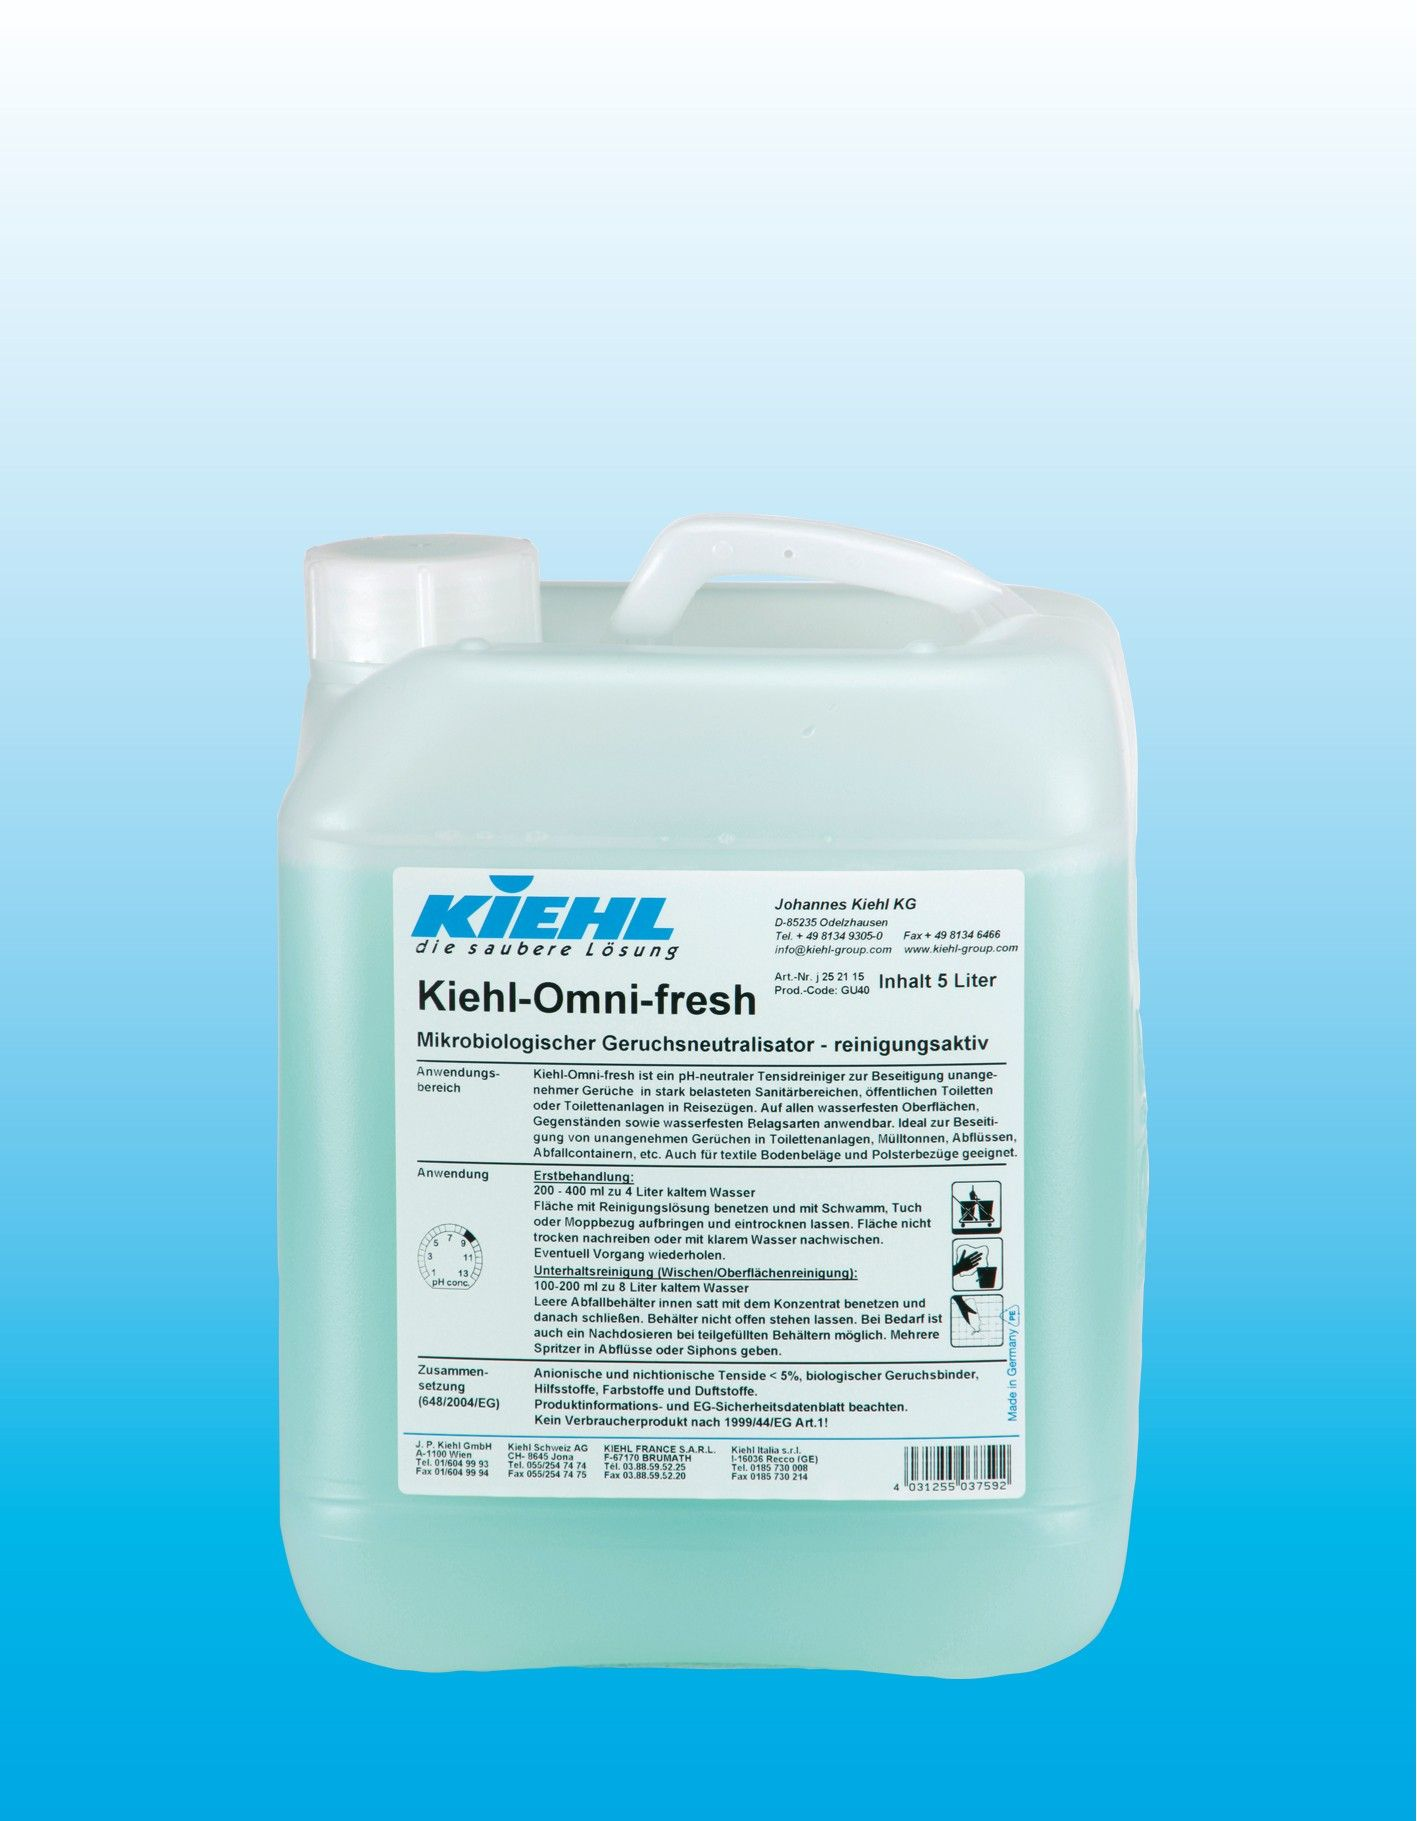 Биологический нейтрализатор запахов, флакон 1 л, Kiehl-Omni-fresh, Johannes Kiehl KG